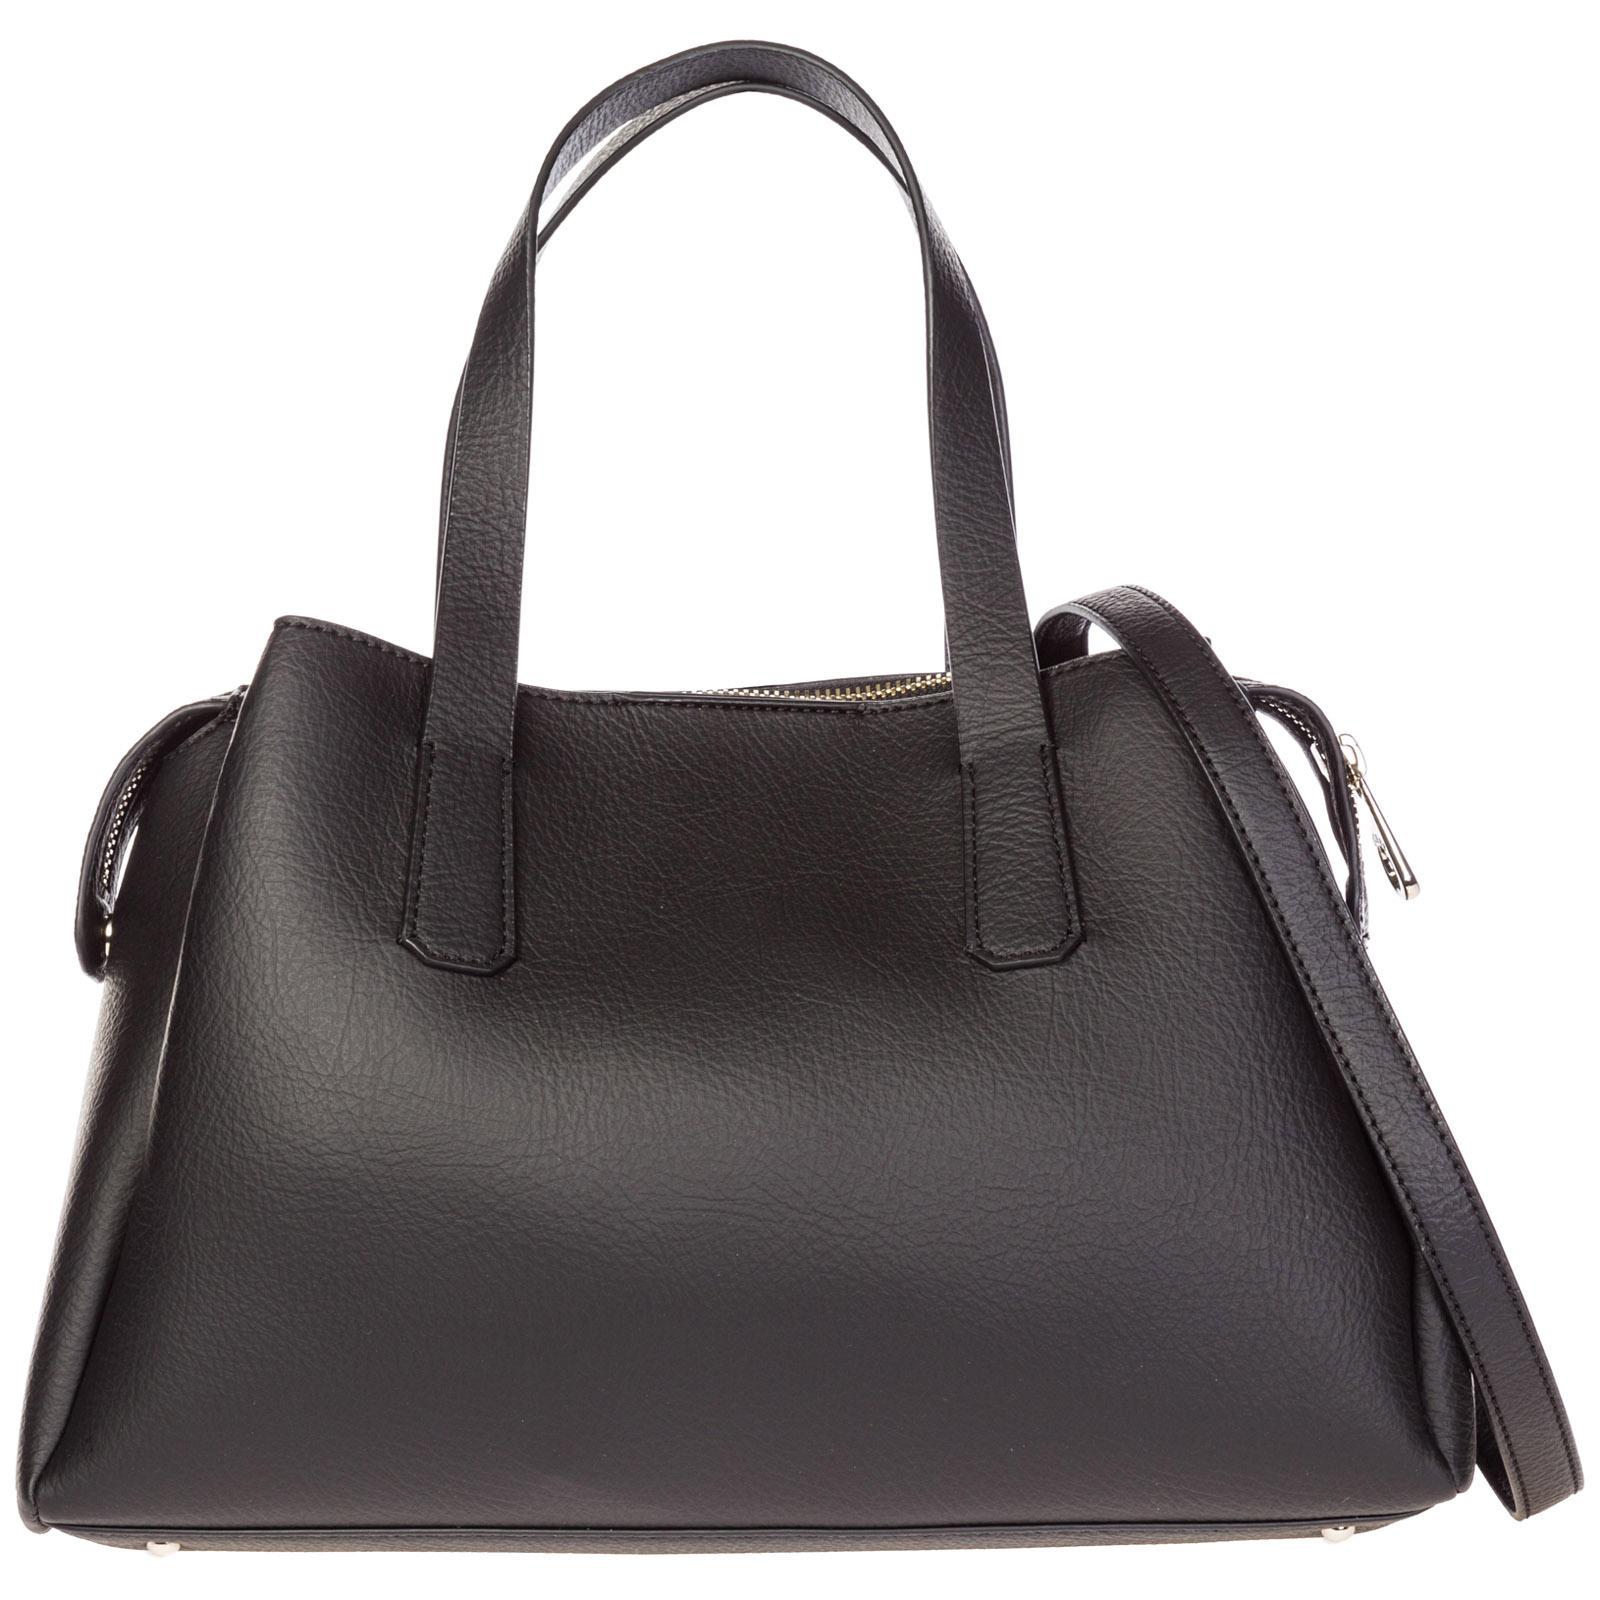 Guess Women s handbag shopping bag purse trudy 1f2687e2a2895